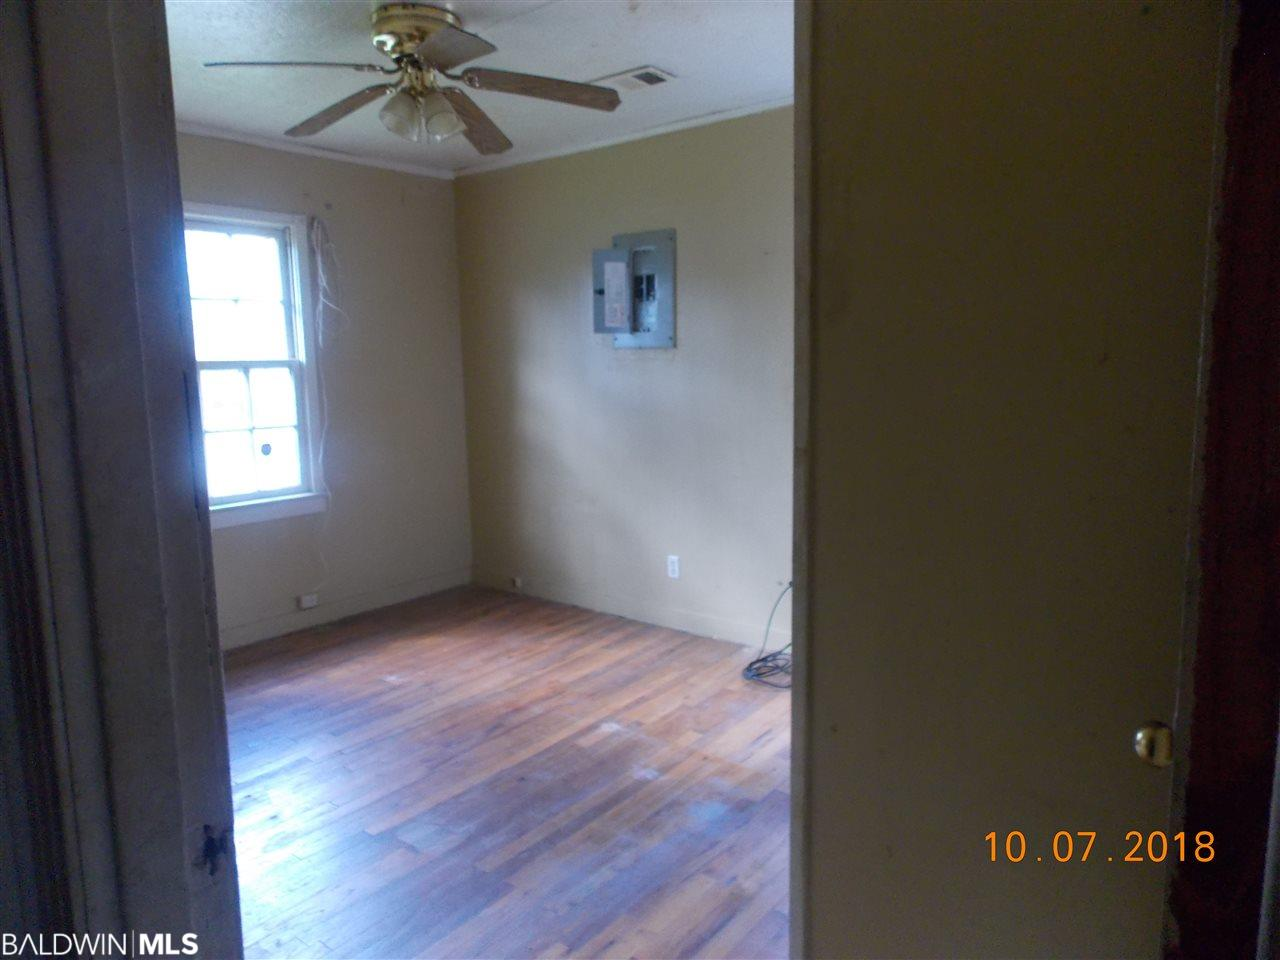 129 Liles Blvd, Brewton, AL 36426